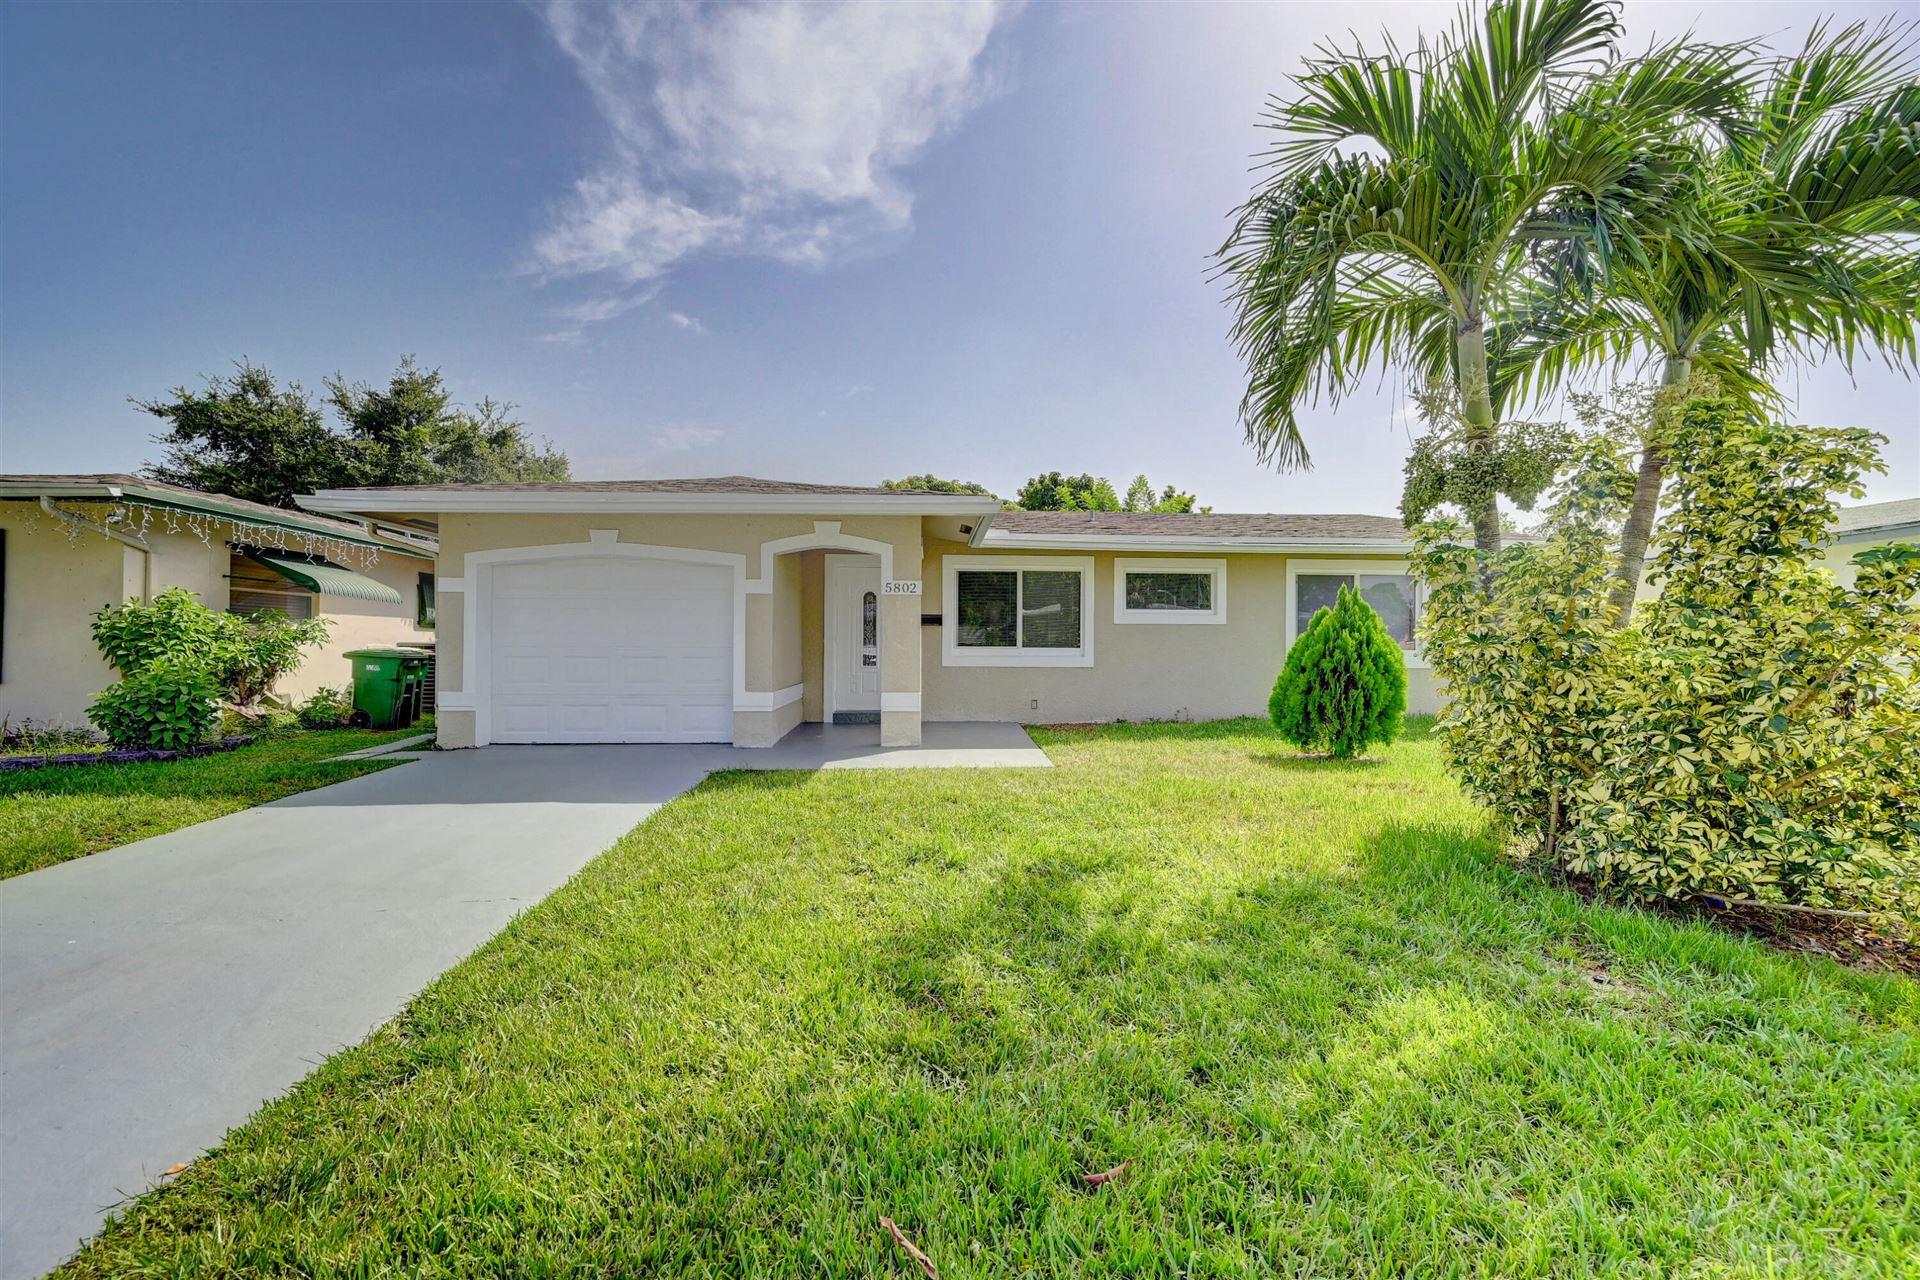 5802 NW 70 Ter Terrace, Tamarac, FL 33321 - MLS#: RX-10742994